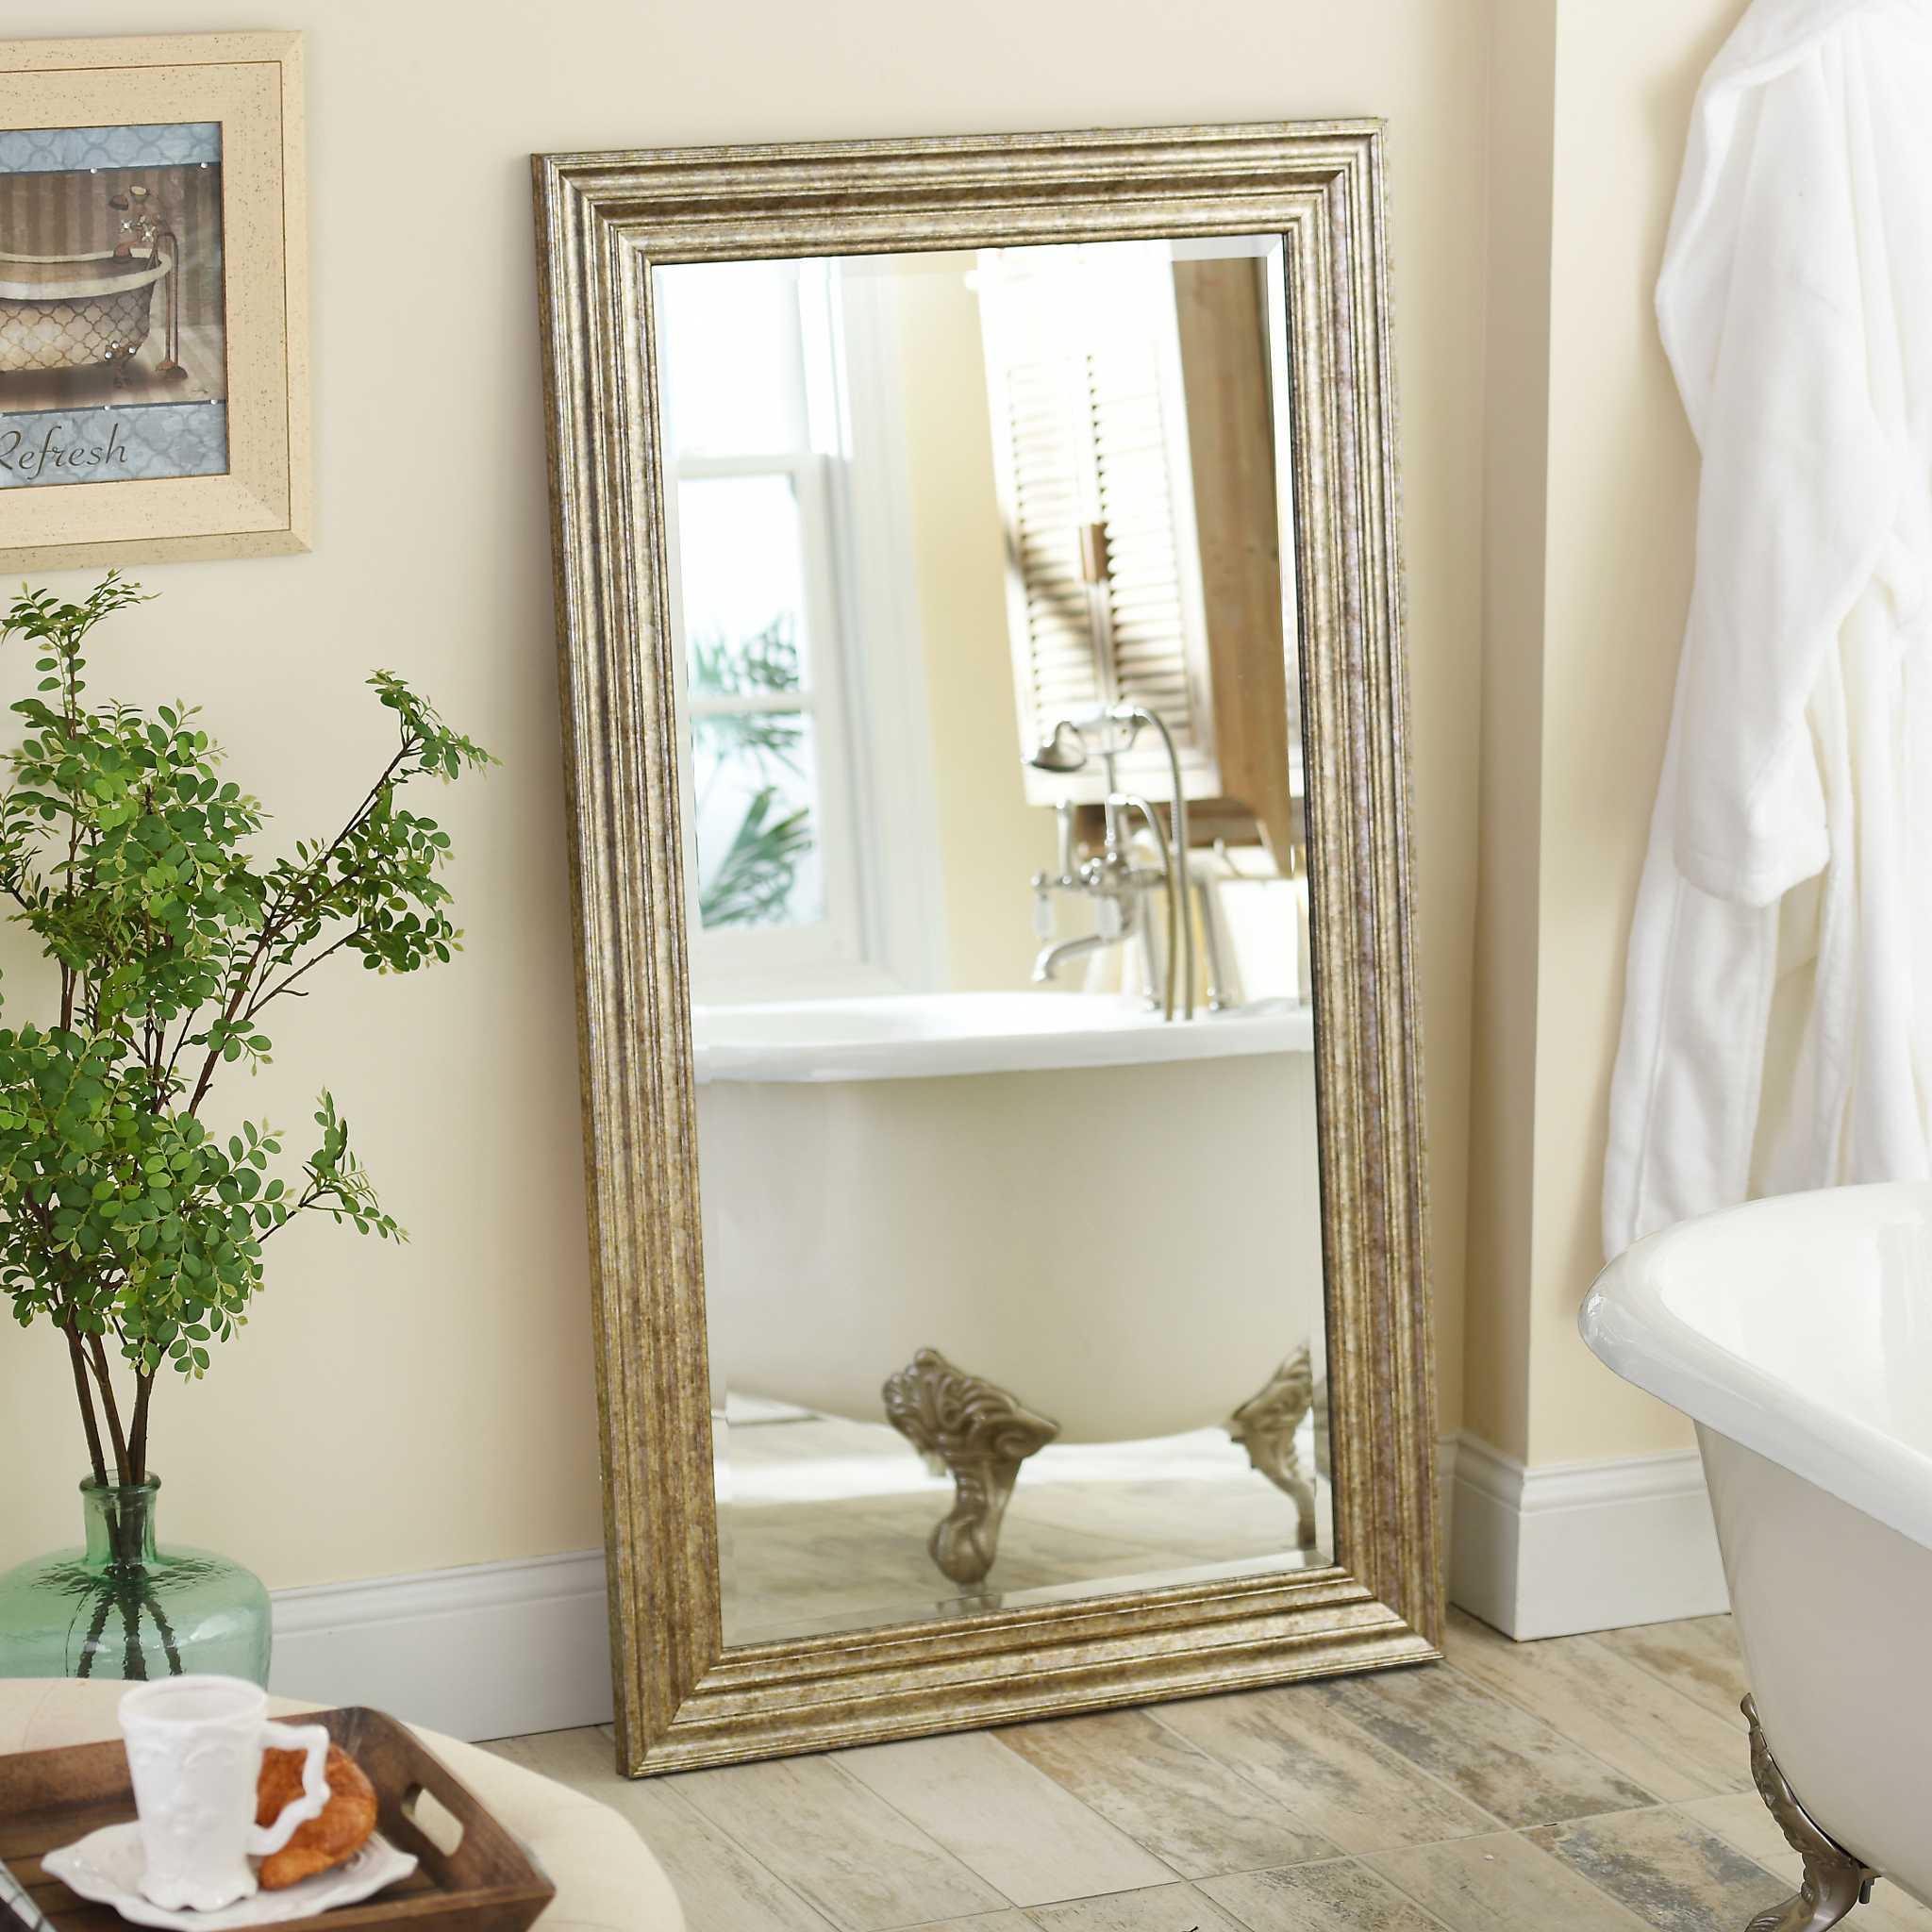 Antique Silver Framed Mirror 32x56 In Kirklands